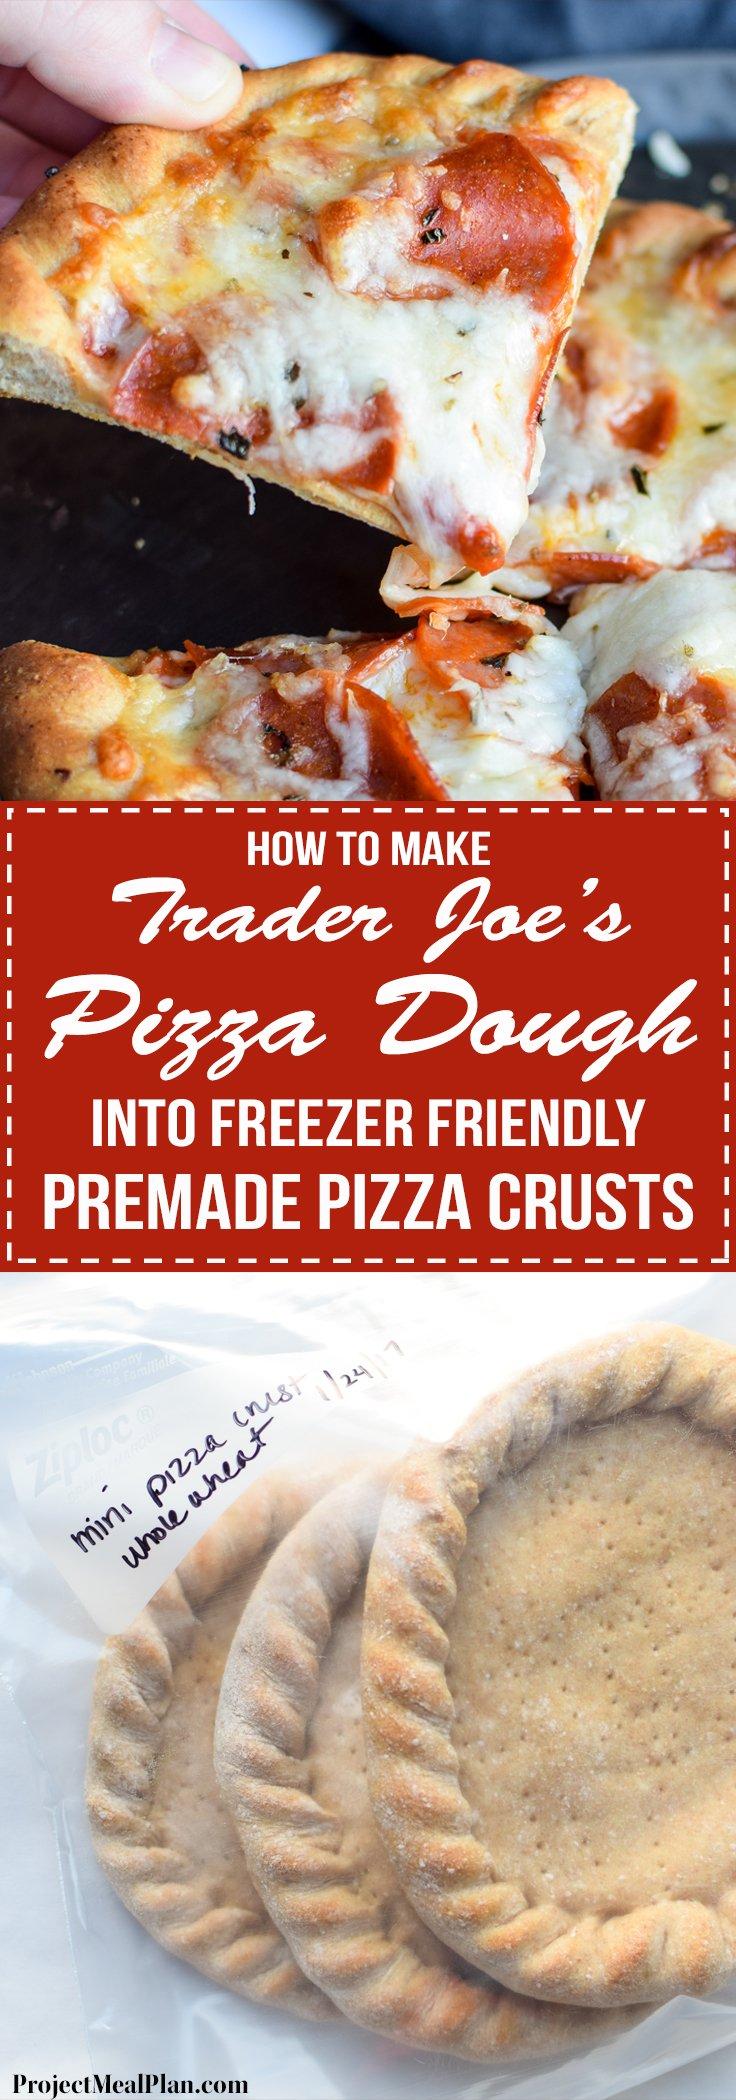 How To Make Trader Joe's Pizza Dough Into Freezer Friendly Premade Pizza Crusts - Four mini pizza crusts in the freezer for emergencies!! Using SUPER cheap Trader Joe's dough! - ProjectMealPlan.com